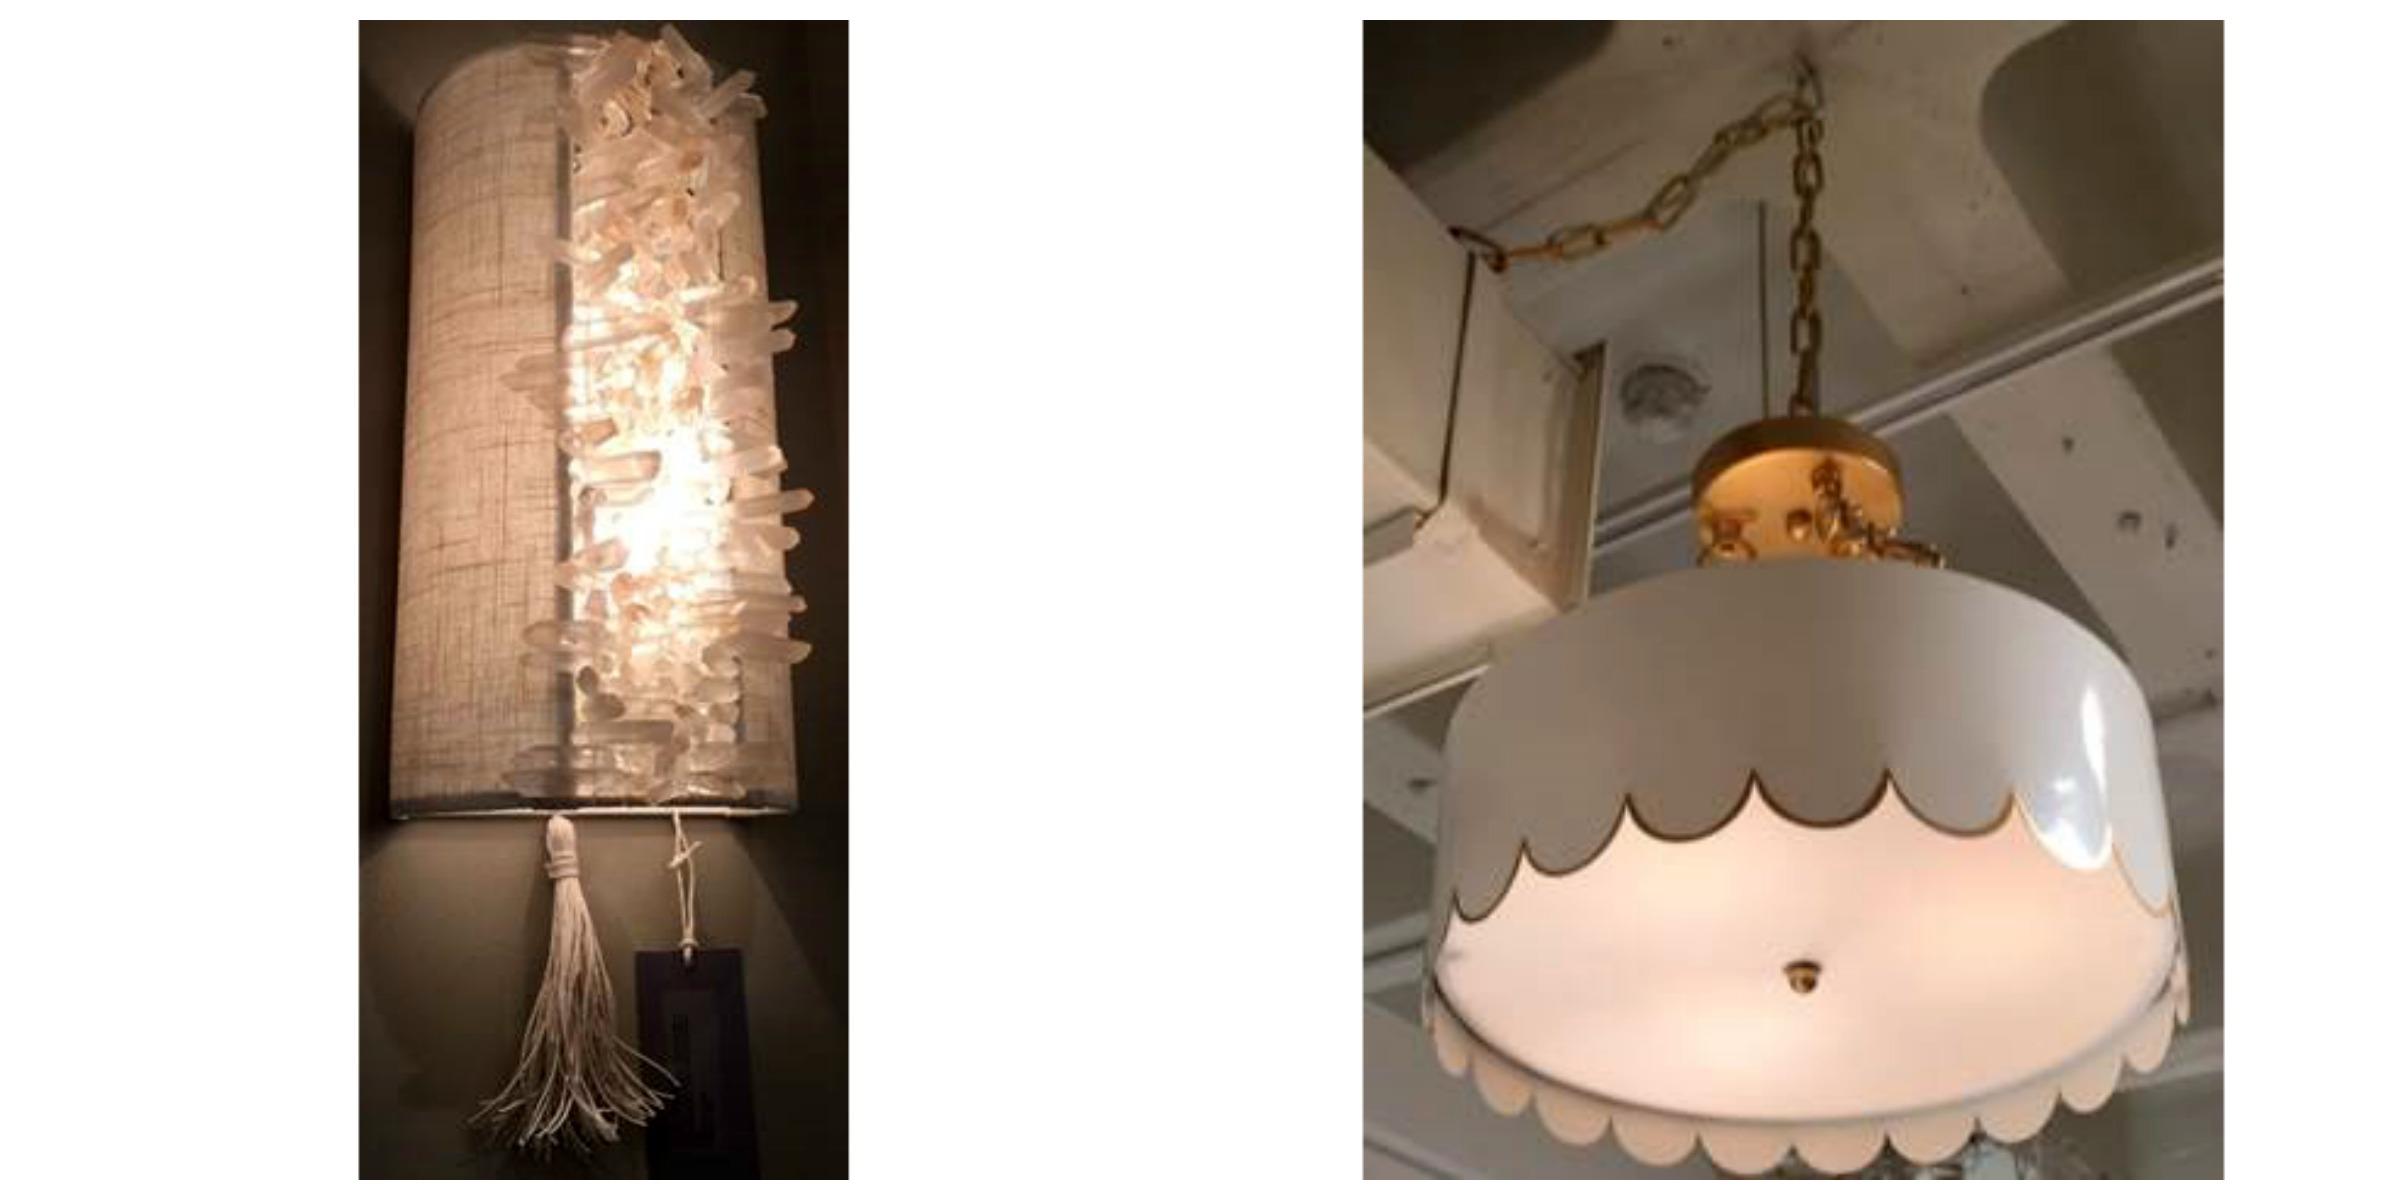 Lighting Collage 5 of Twin Companies